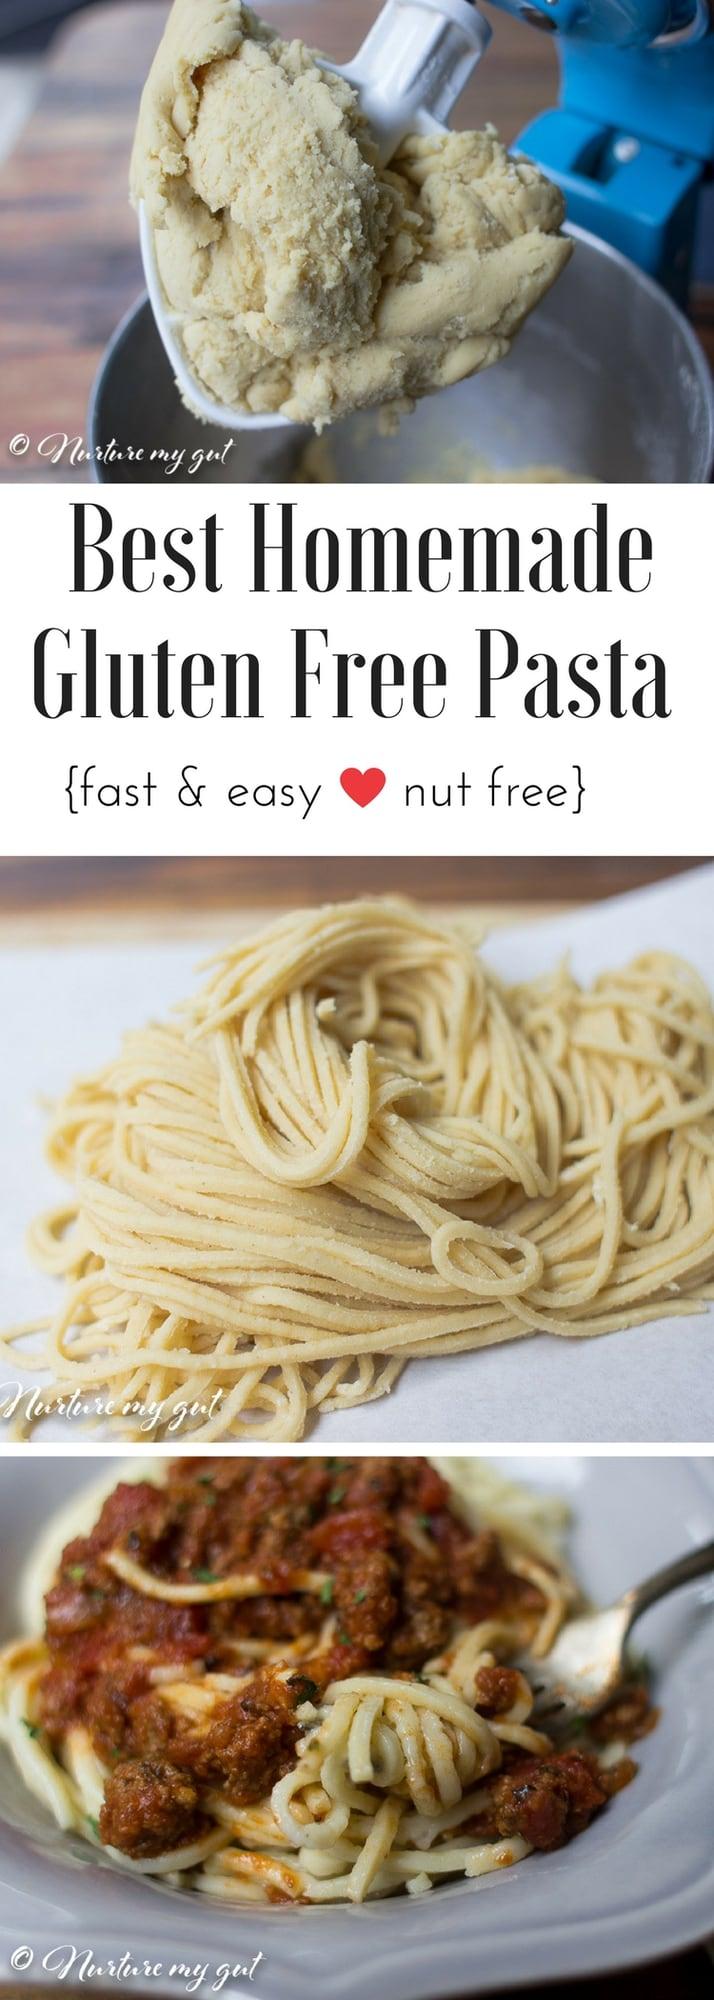 Best Homemade Gluten Free Pasta